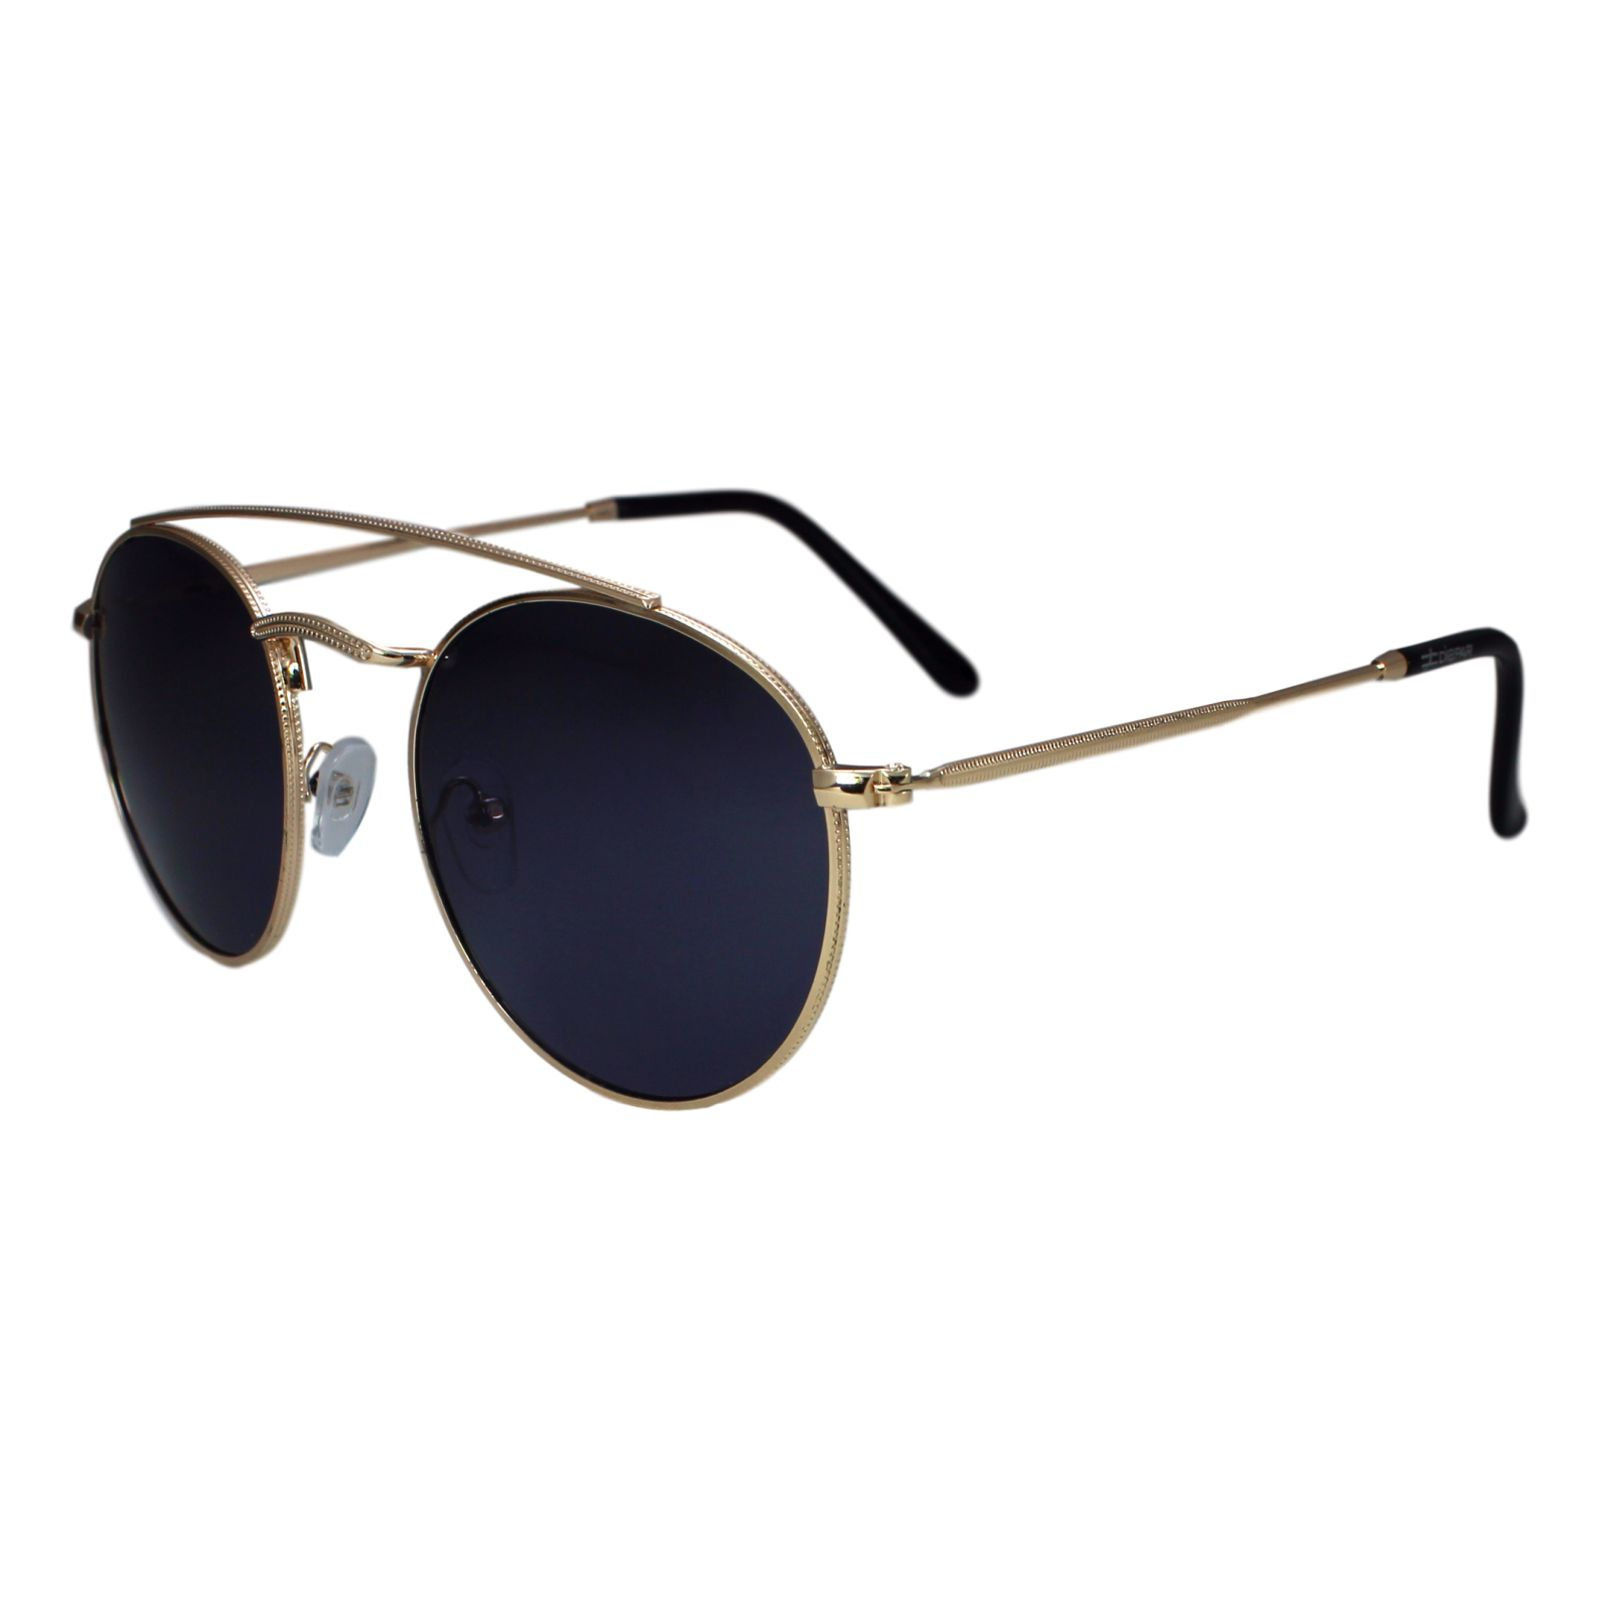 f4c9a3a2e1e3b Óculos De Sol Díspar D1630 Dourado